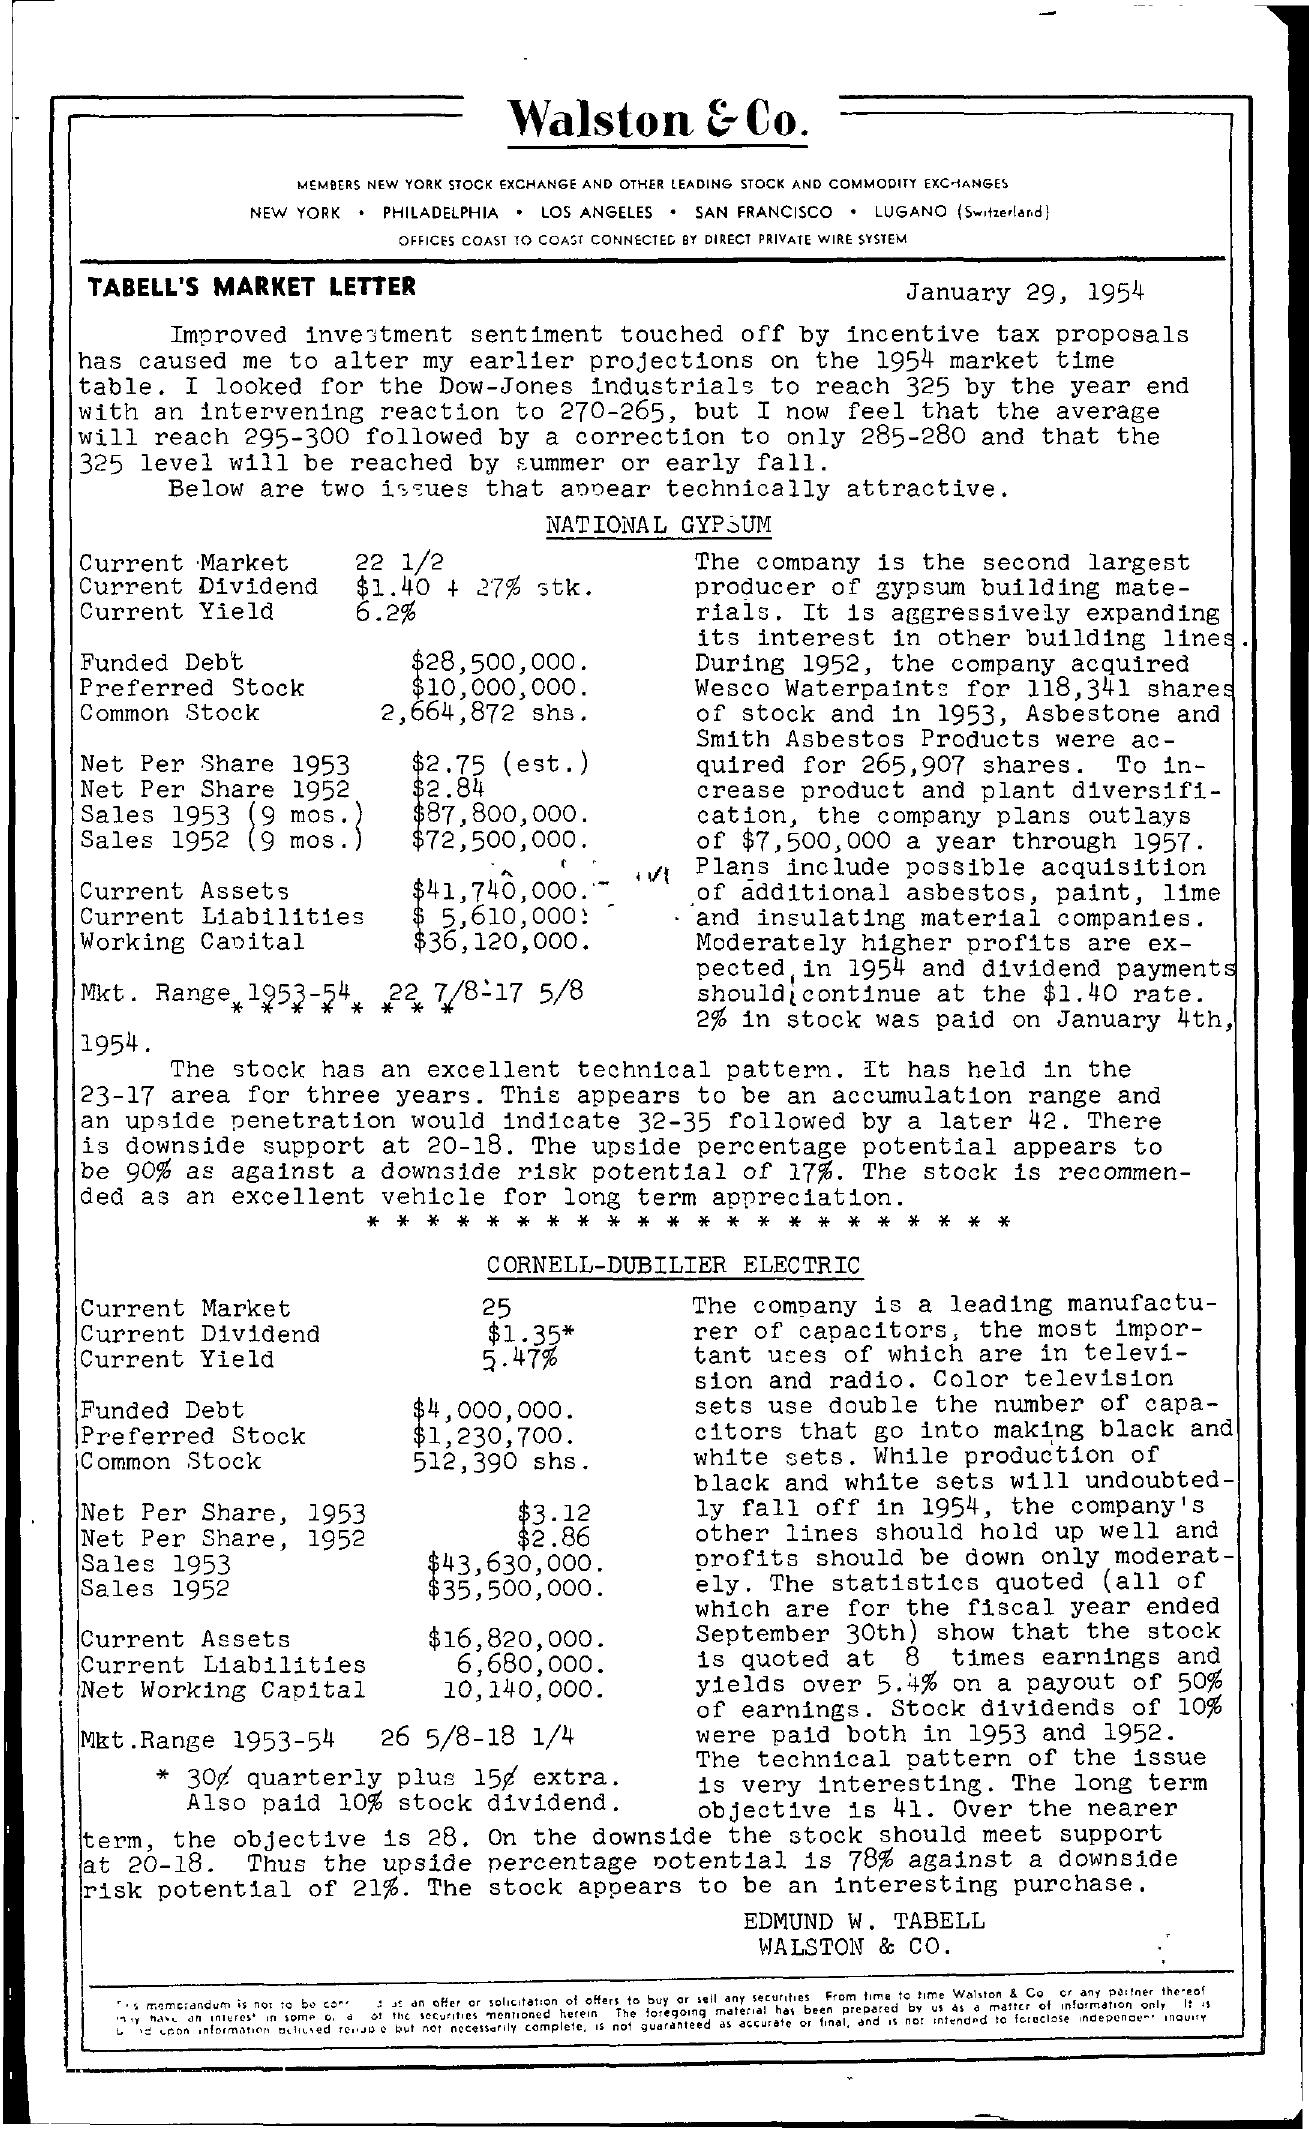 Tabell's Market Letter - January 29, 1954